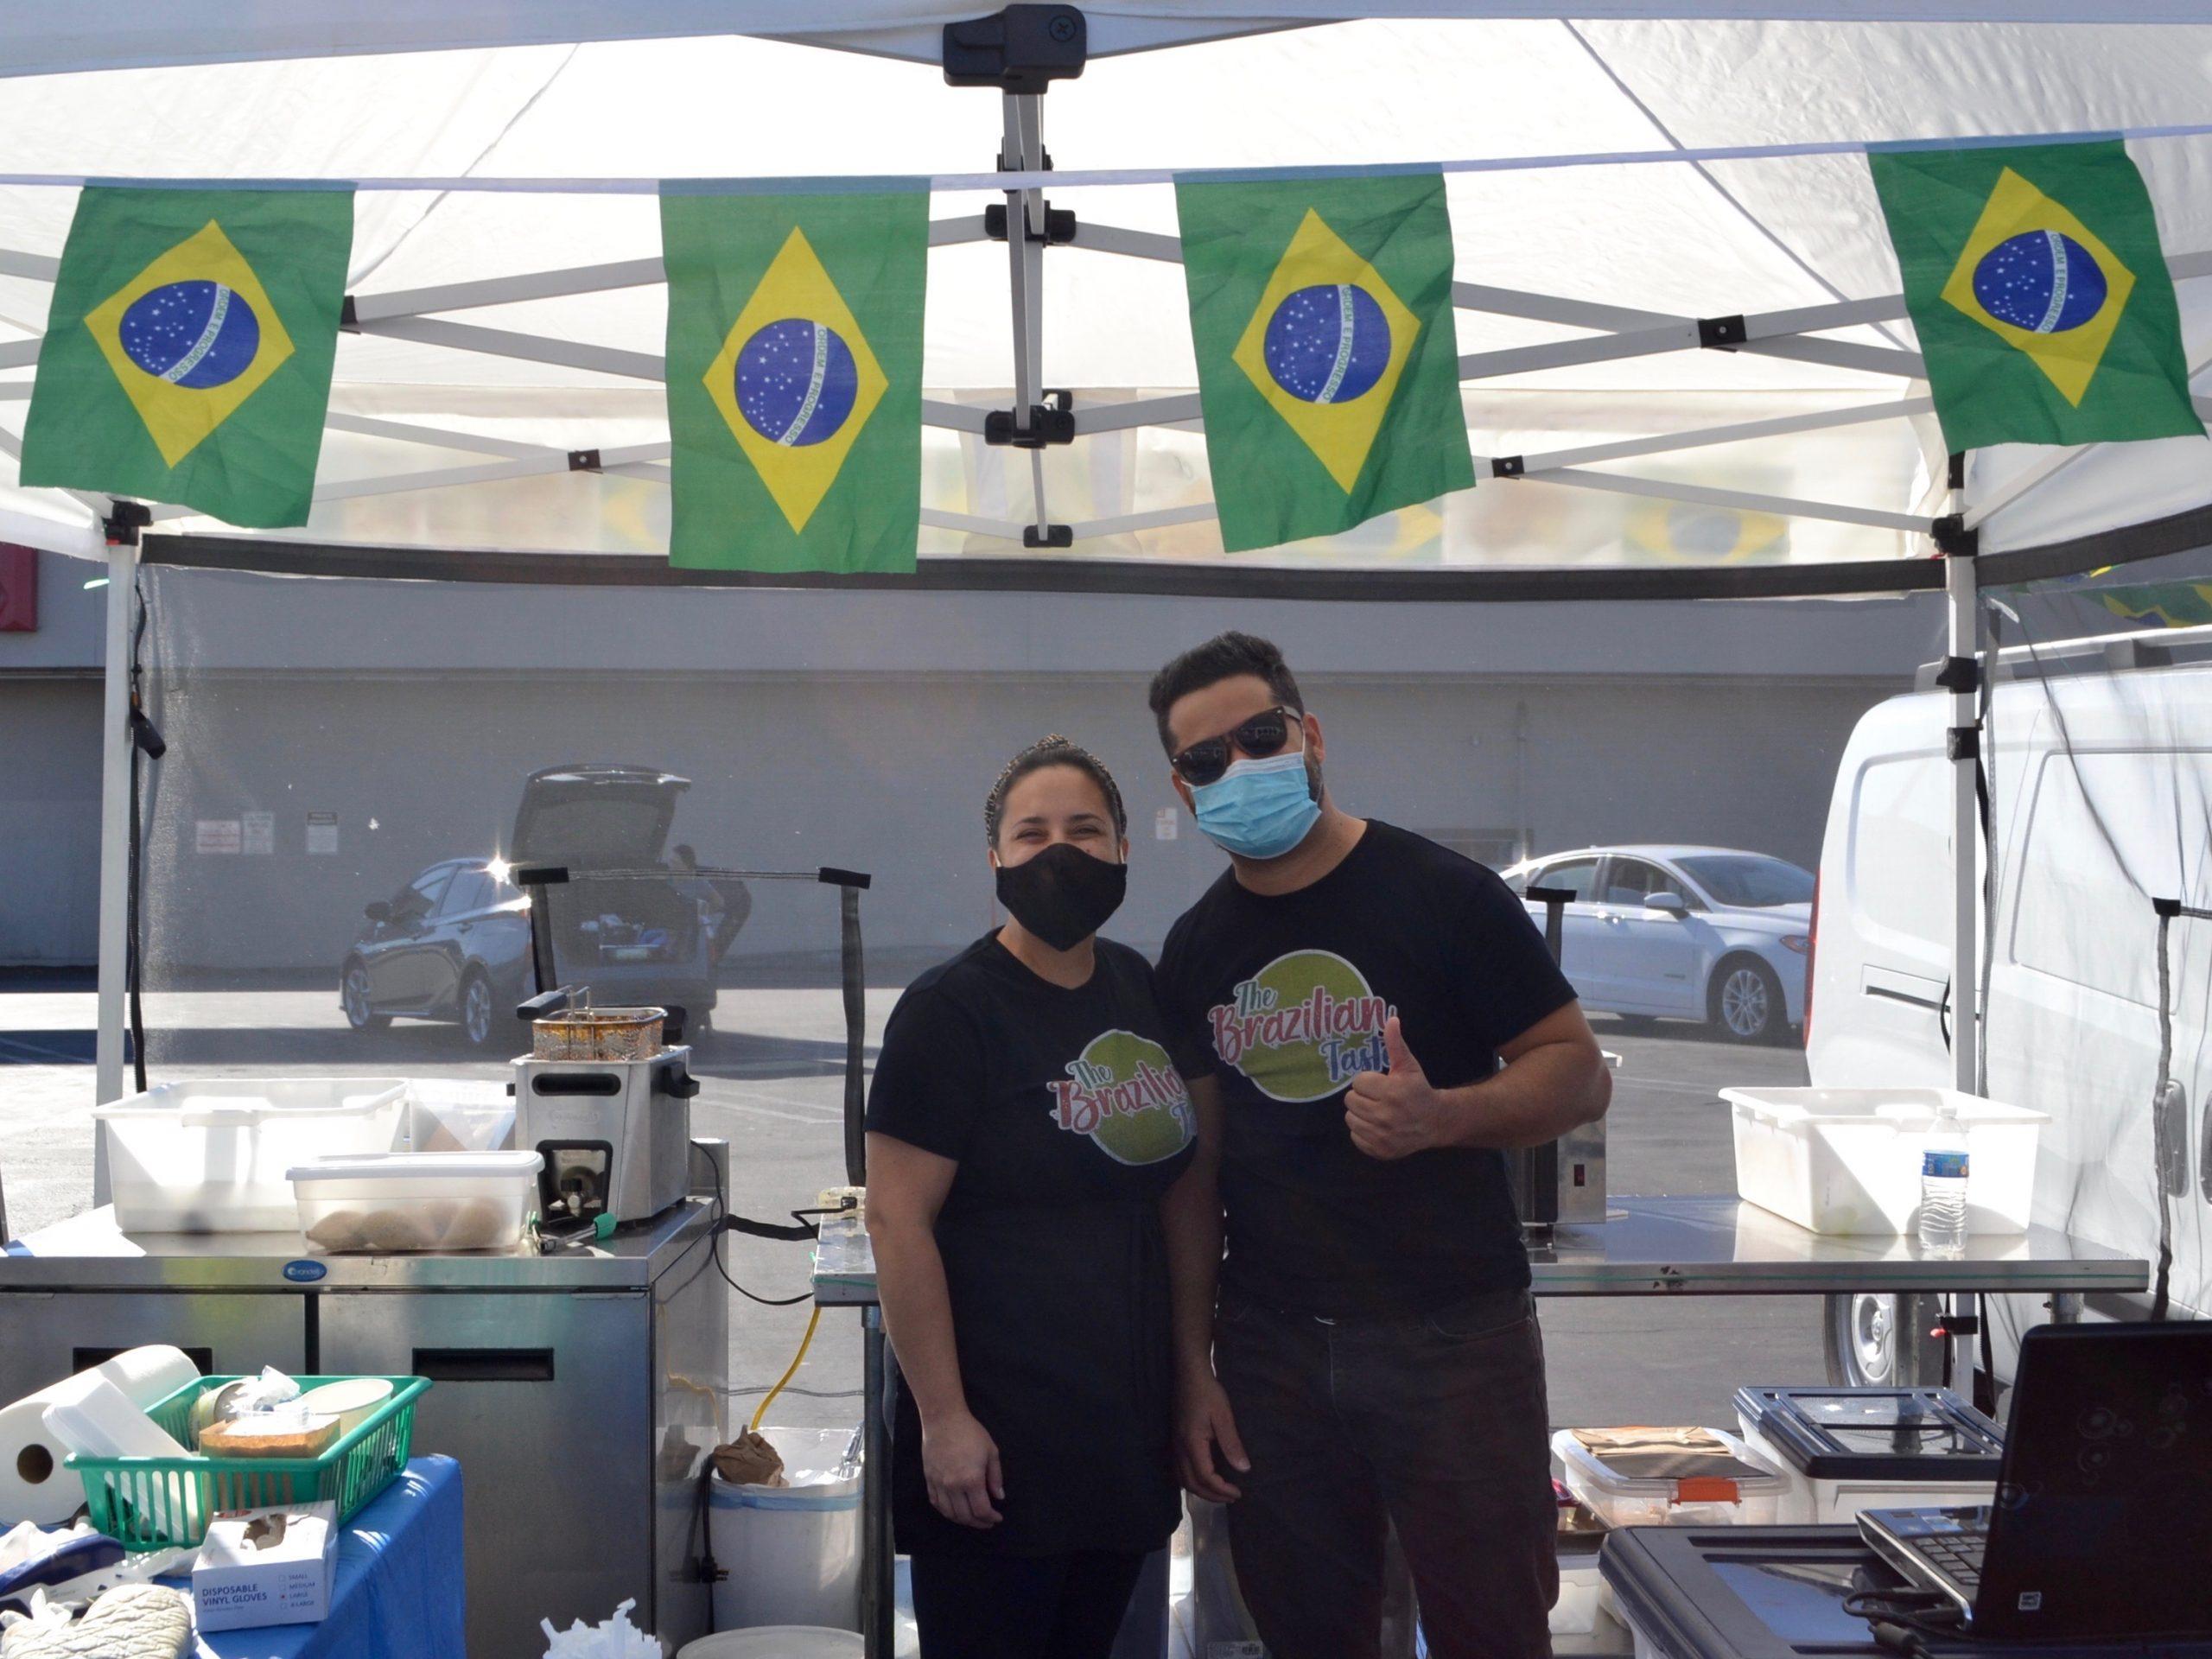 brazilian taste